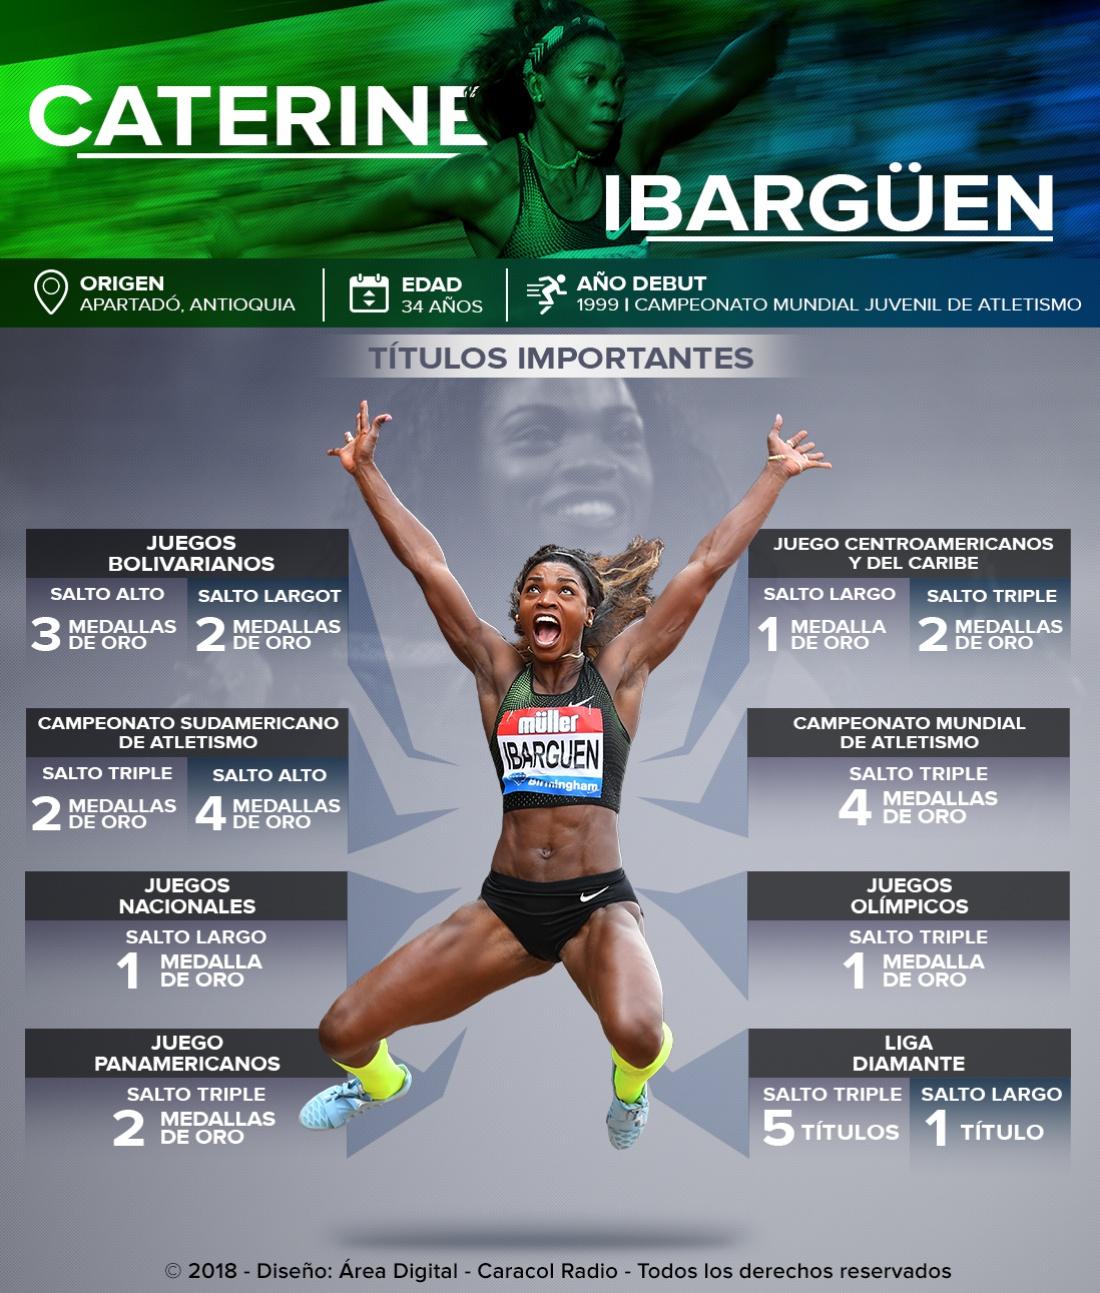 Títulos Caterine Ibargüen: ¡Caterine Ibargüen: la reina del salto mundial!